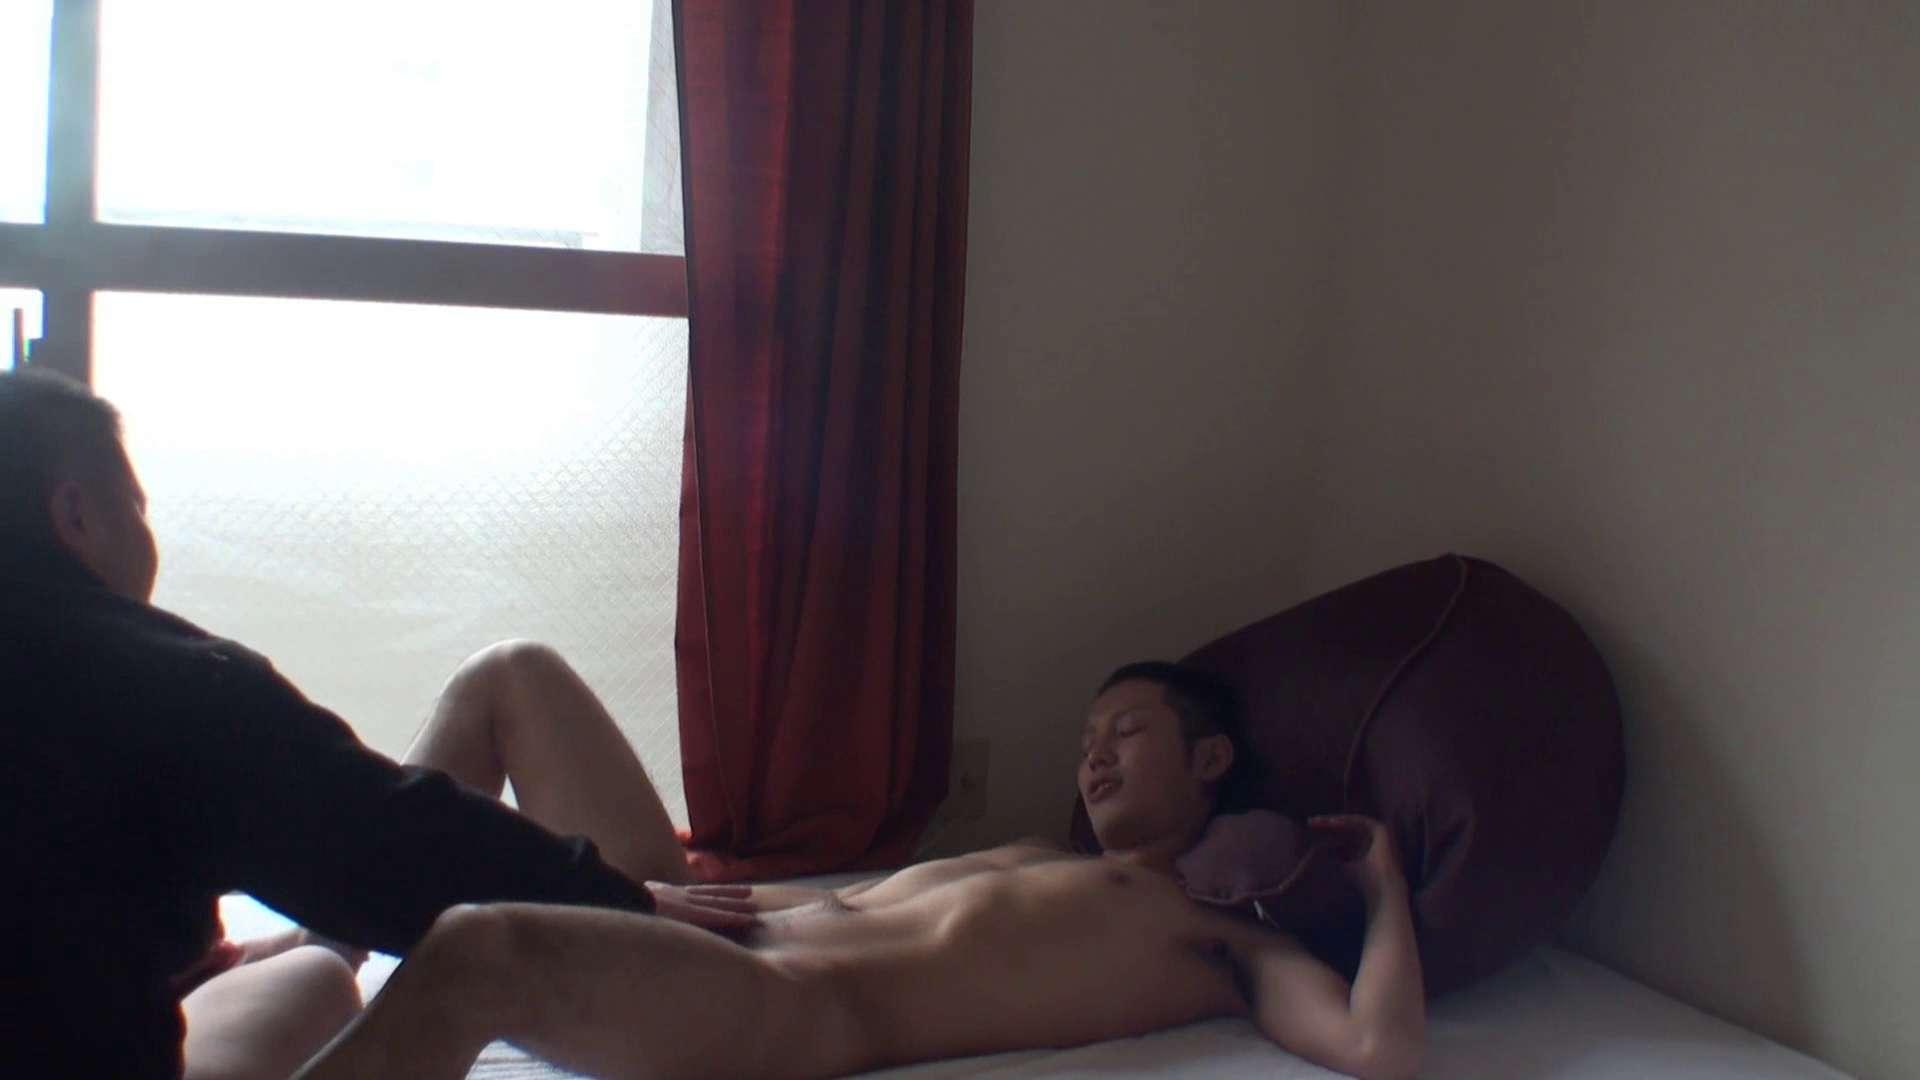 HD 良太と健二当たり前の日常 セックス編 男天国 | サル系ボーイズ  50pic 47